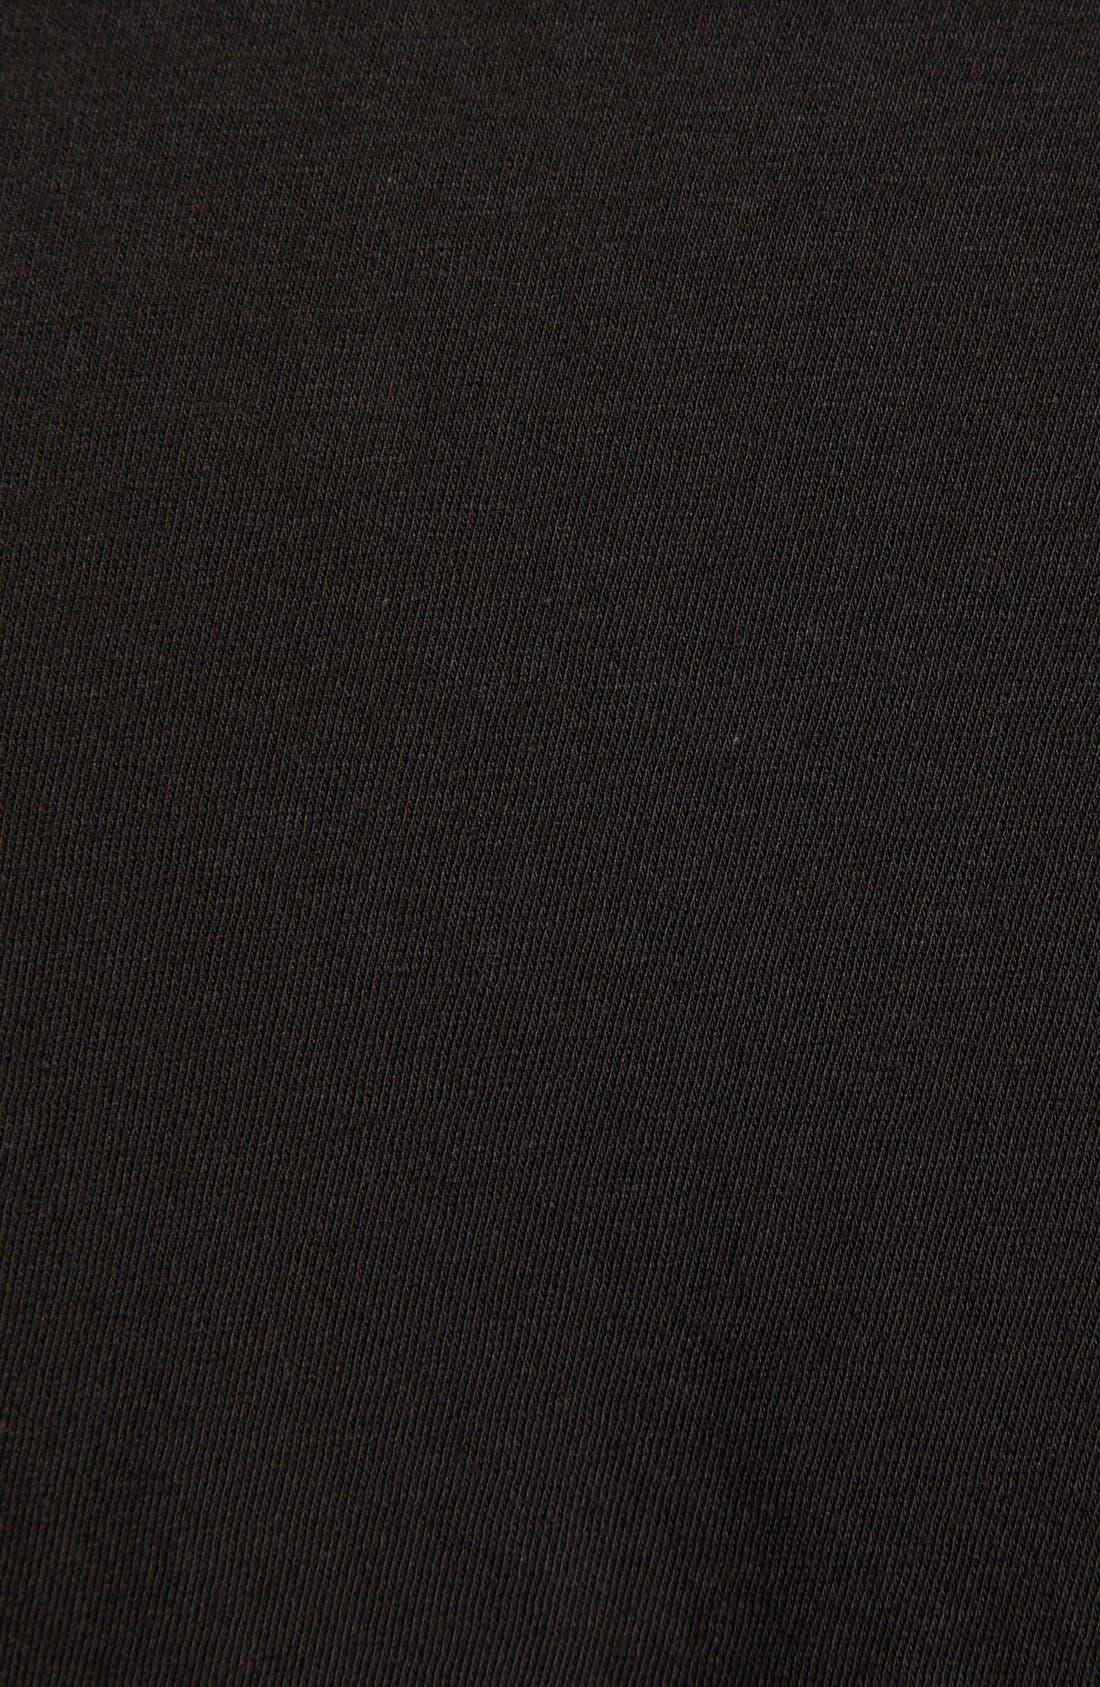 Alternate Image 3  - 47 Brand 'New York Yankees - Camo Flanker' Graphic T-Shirt